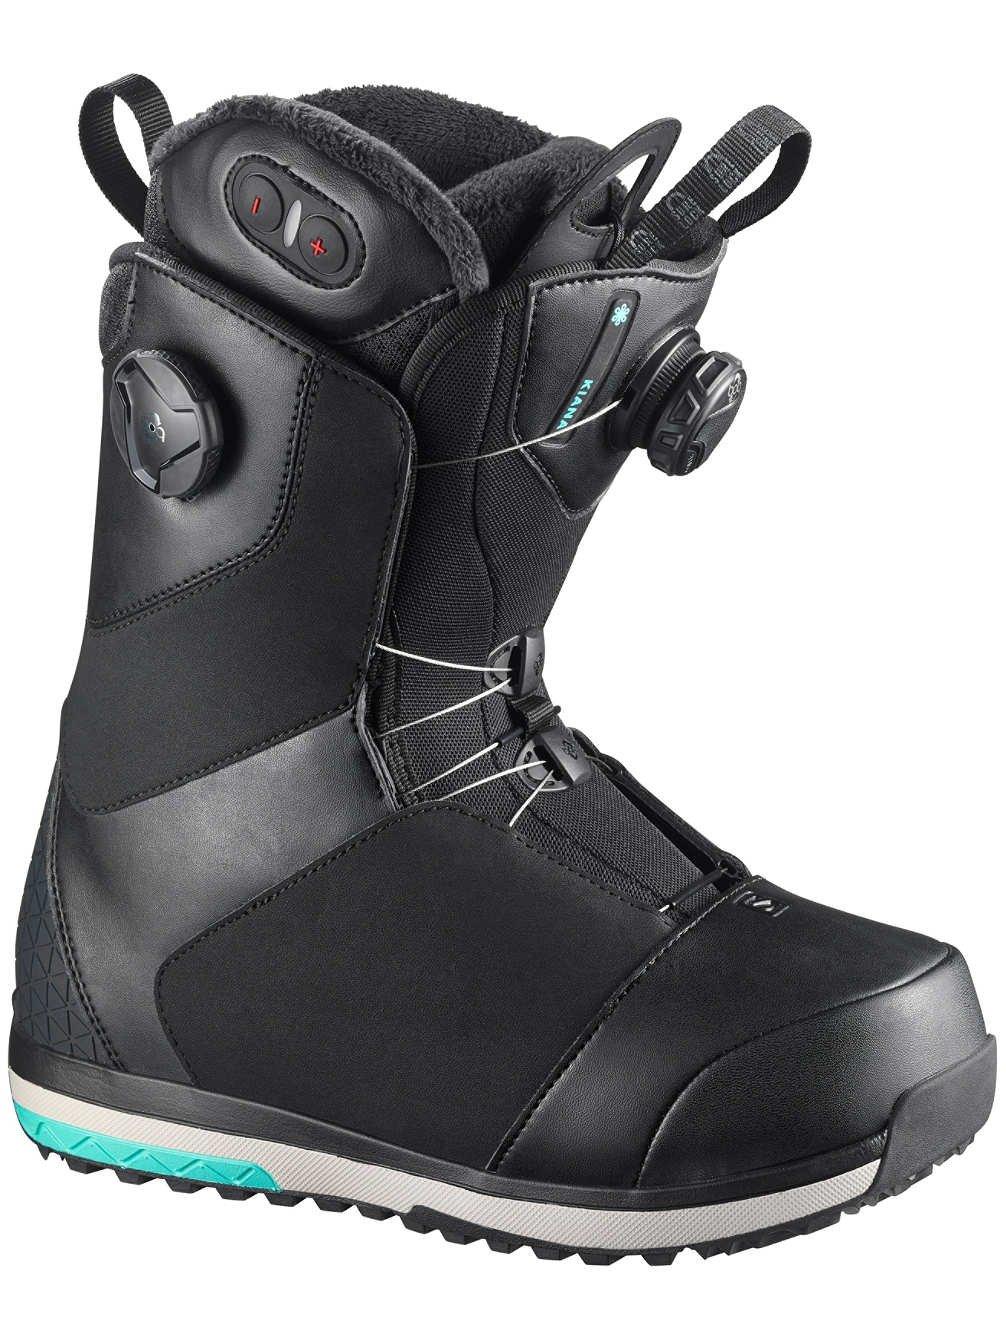 Salomon Snowboard Boot Women Kiana